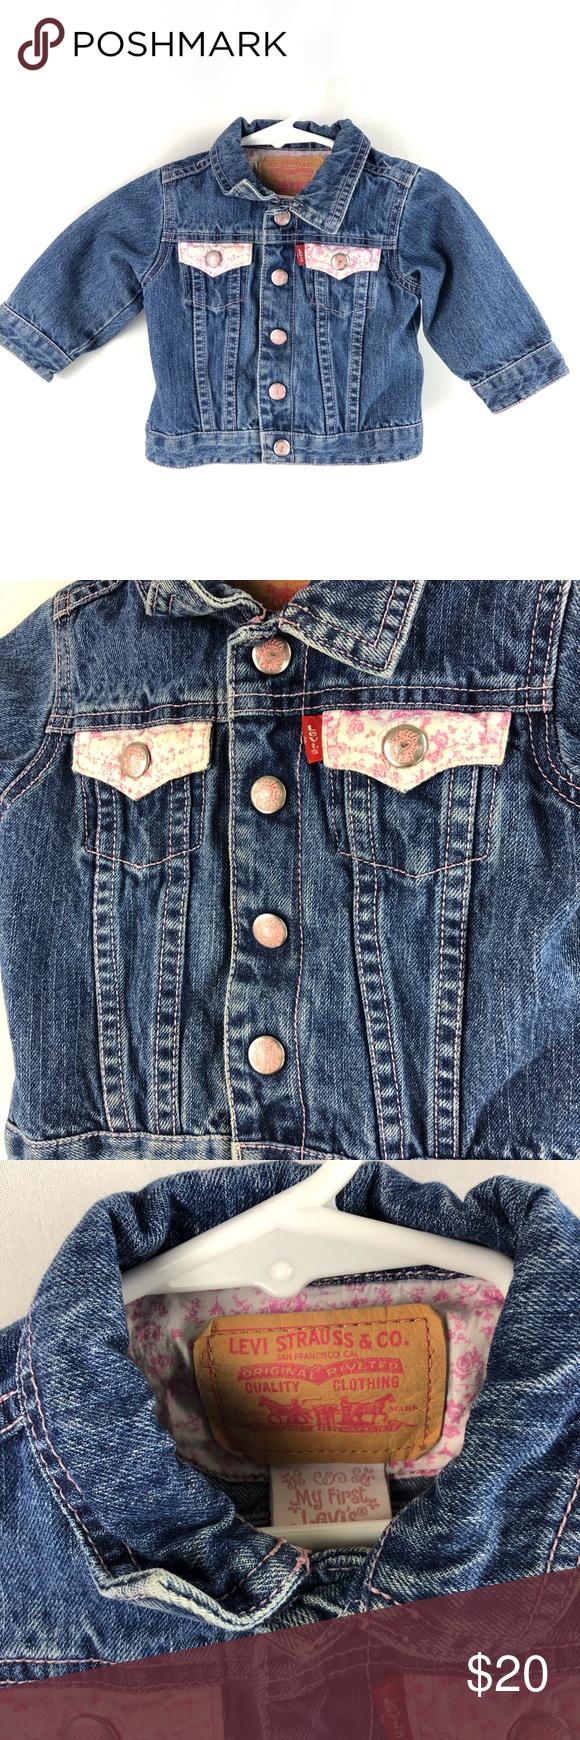 Levi S My First Levi S Baby Girl Jean Jacket Levi S My First Levi S Baby Girl Denim Jean Jacket Size Jean Jacket For Girls Baby Girl Jeans Girls Denim [ 1740 x 580 Pixel ]